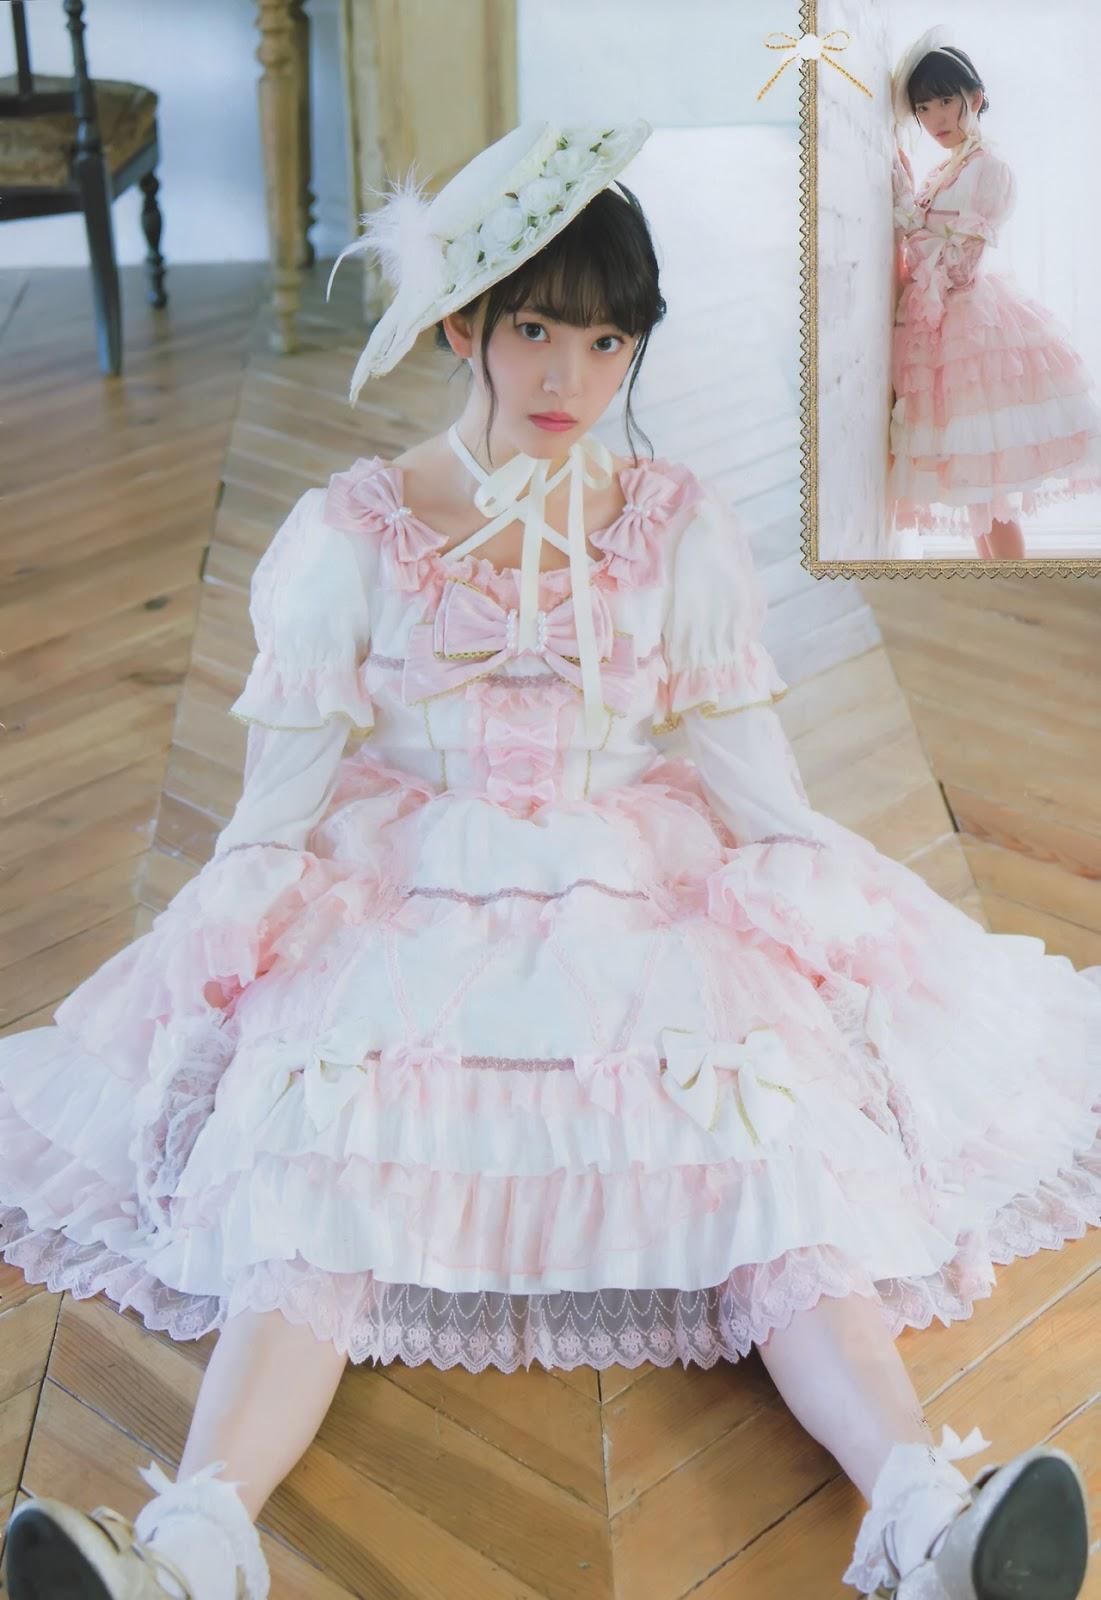 Hori Miona 堀未央奈 Nogizaka46, Shonen Champion 2017.04.06 No.17 (週刊少年チャンピオン 2017年17号)